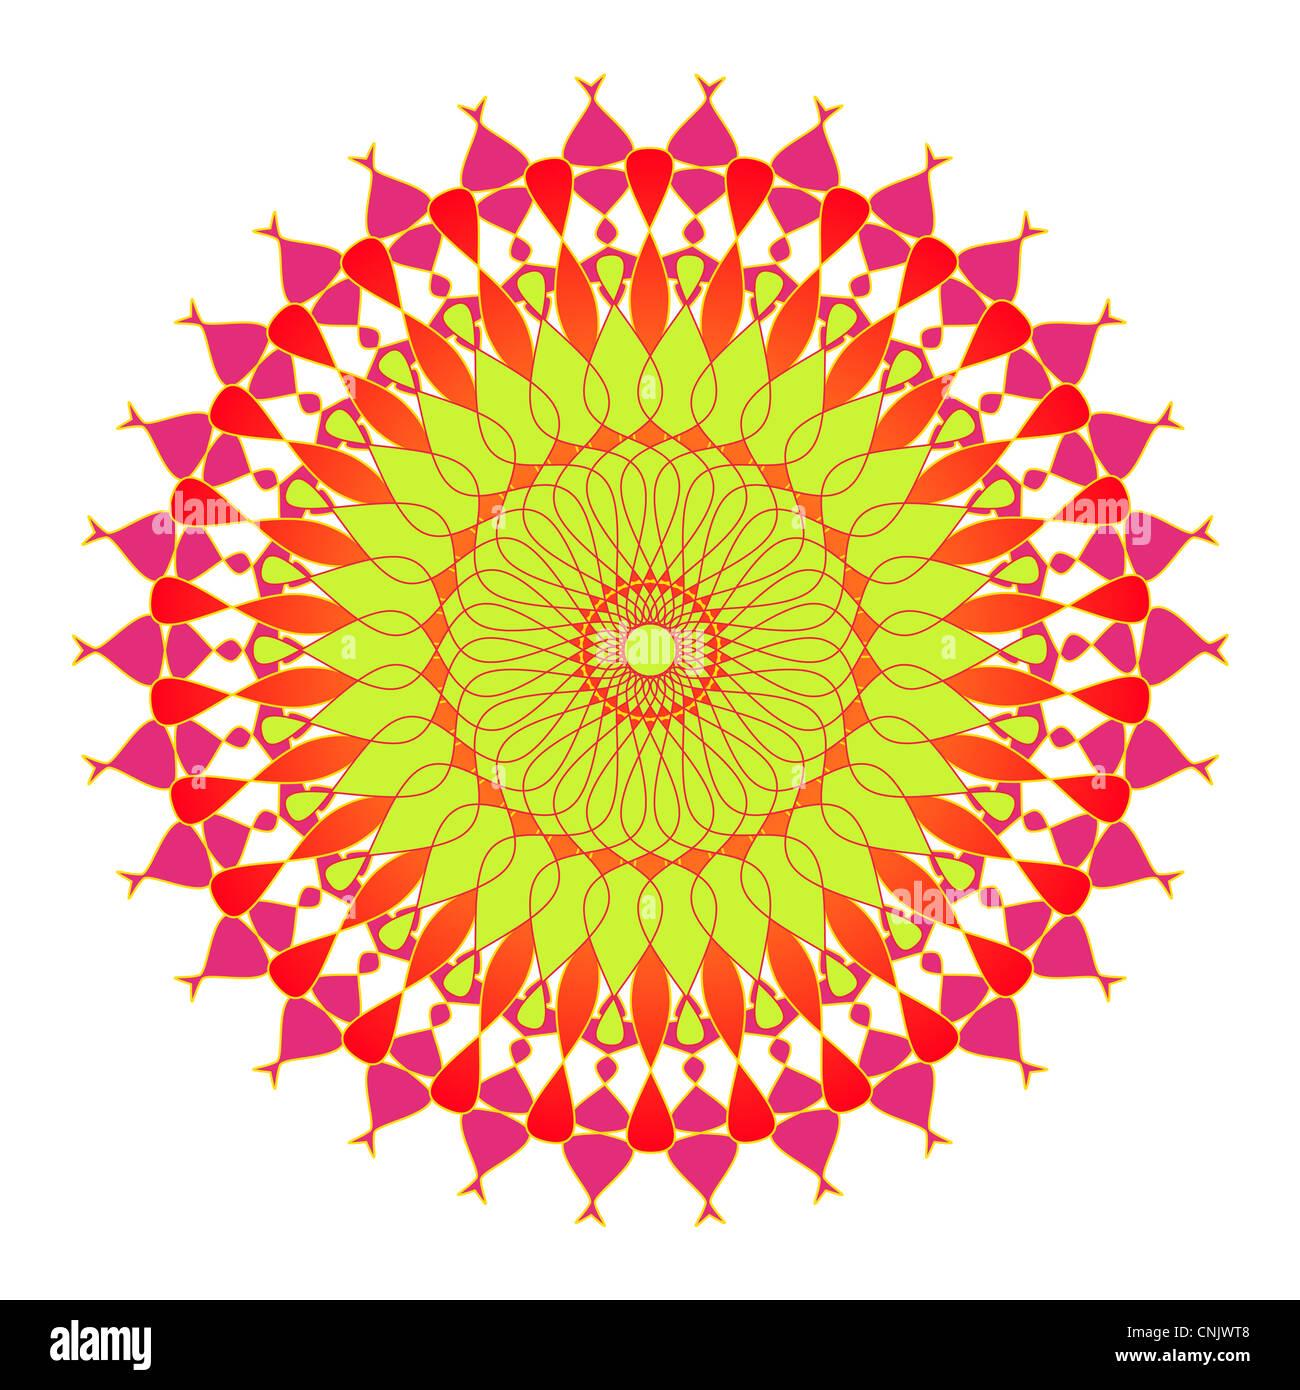 Artistic mandala design in green, pink and orange colors Stock Photo